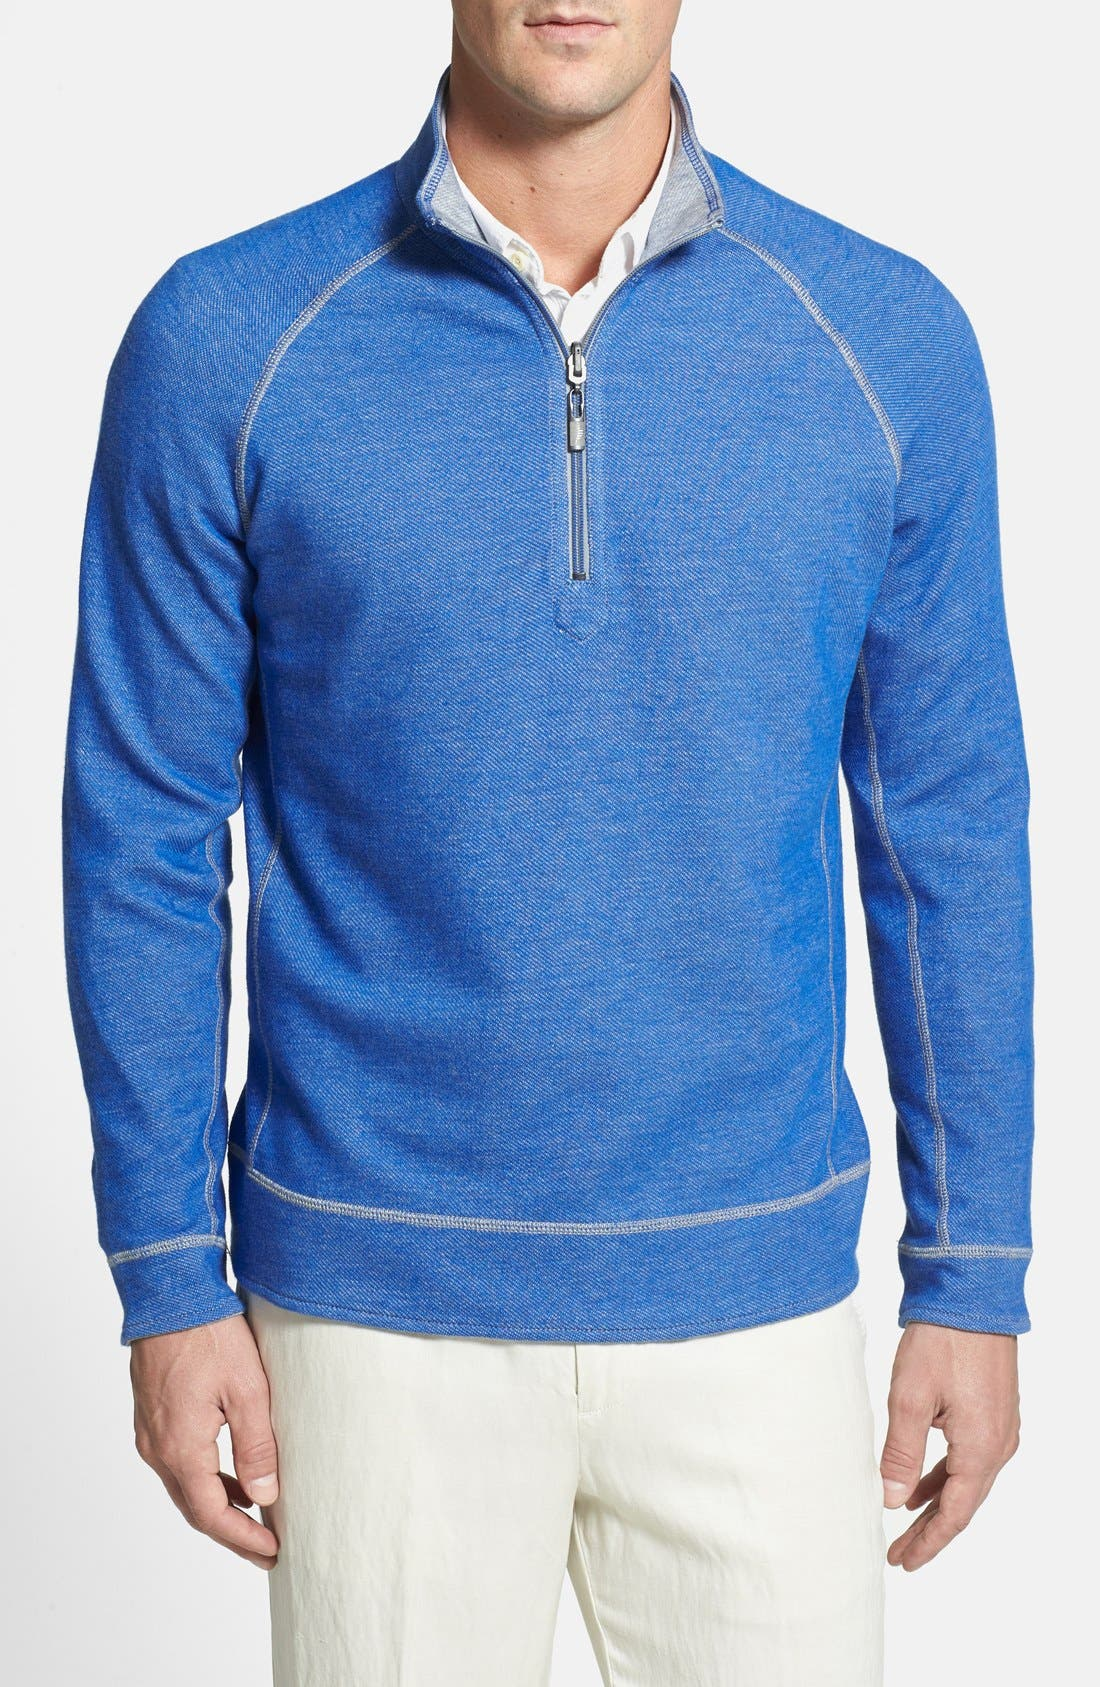 Main Image - Tommy Bahama Denim 'Bob Twillin' Island Modern Fit Reversible Half Zip Sweatshirt